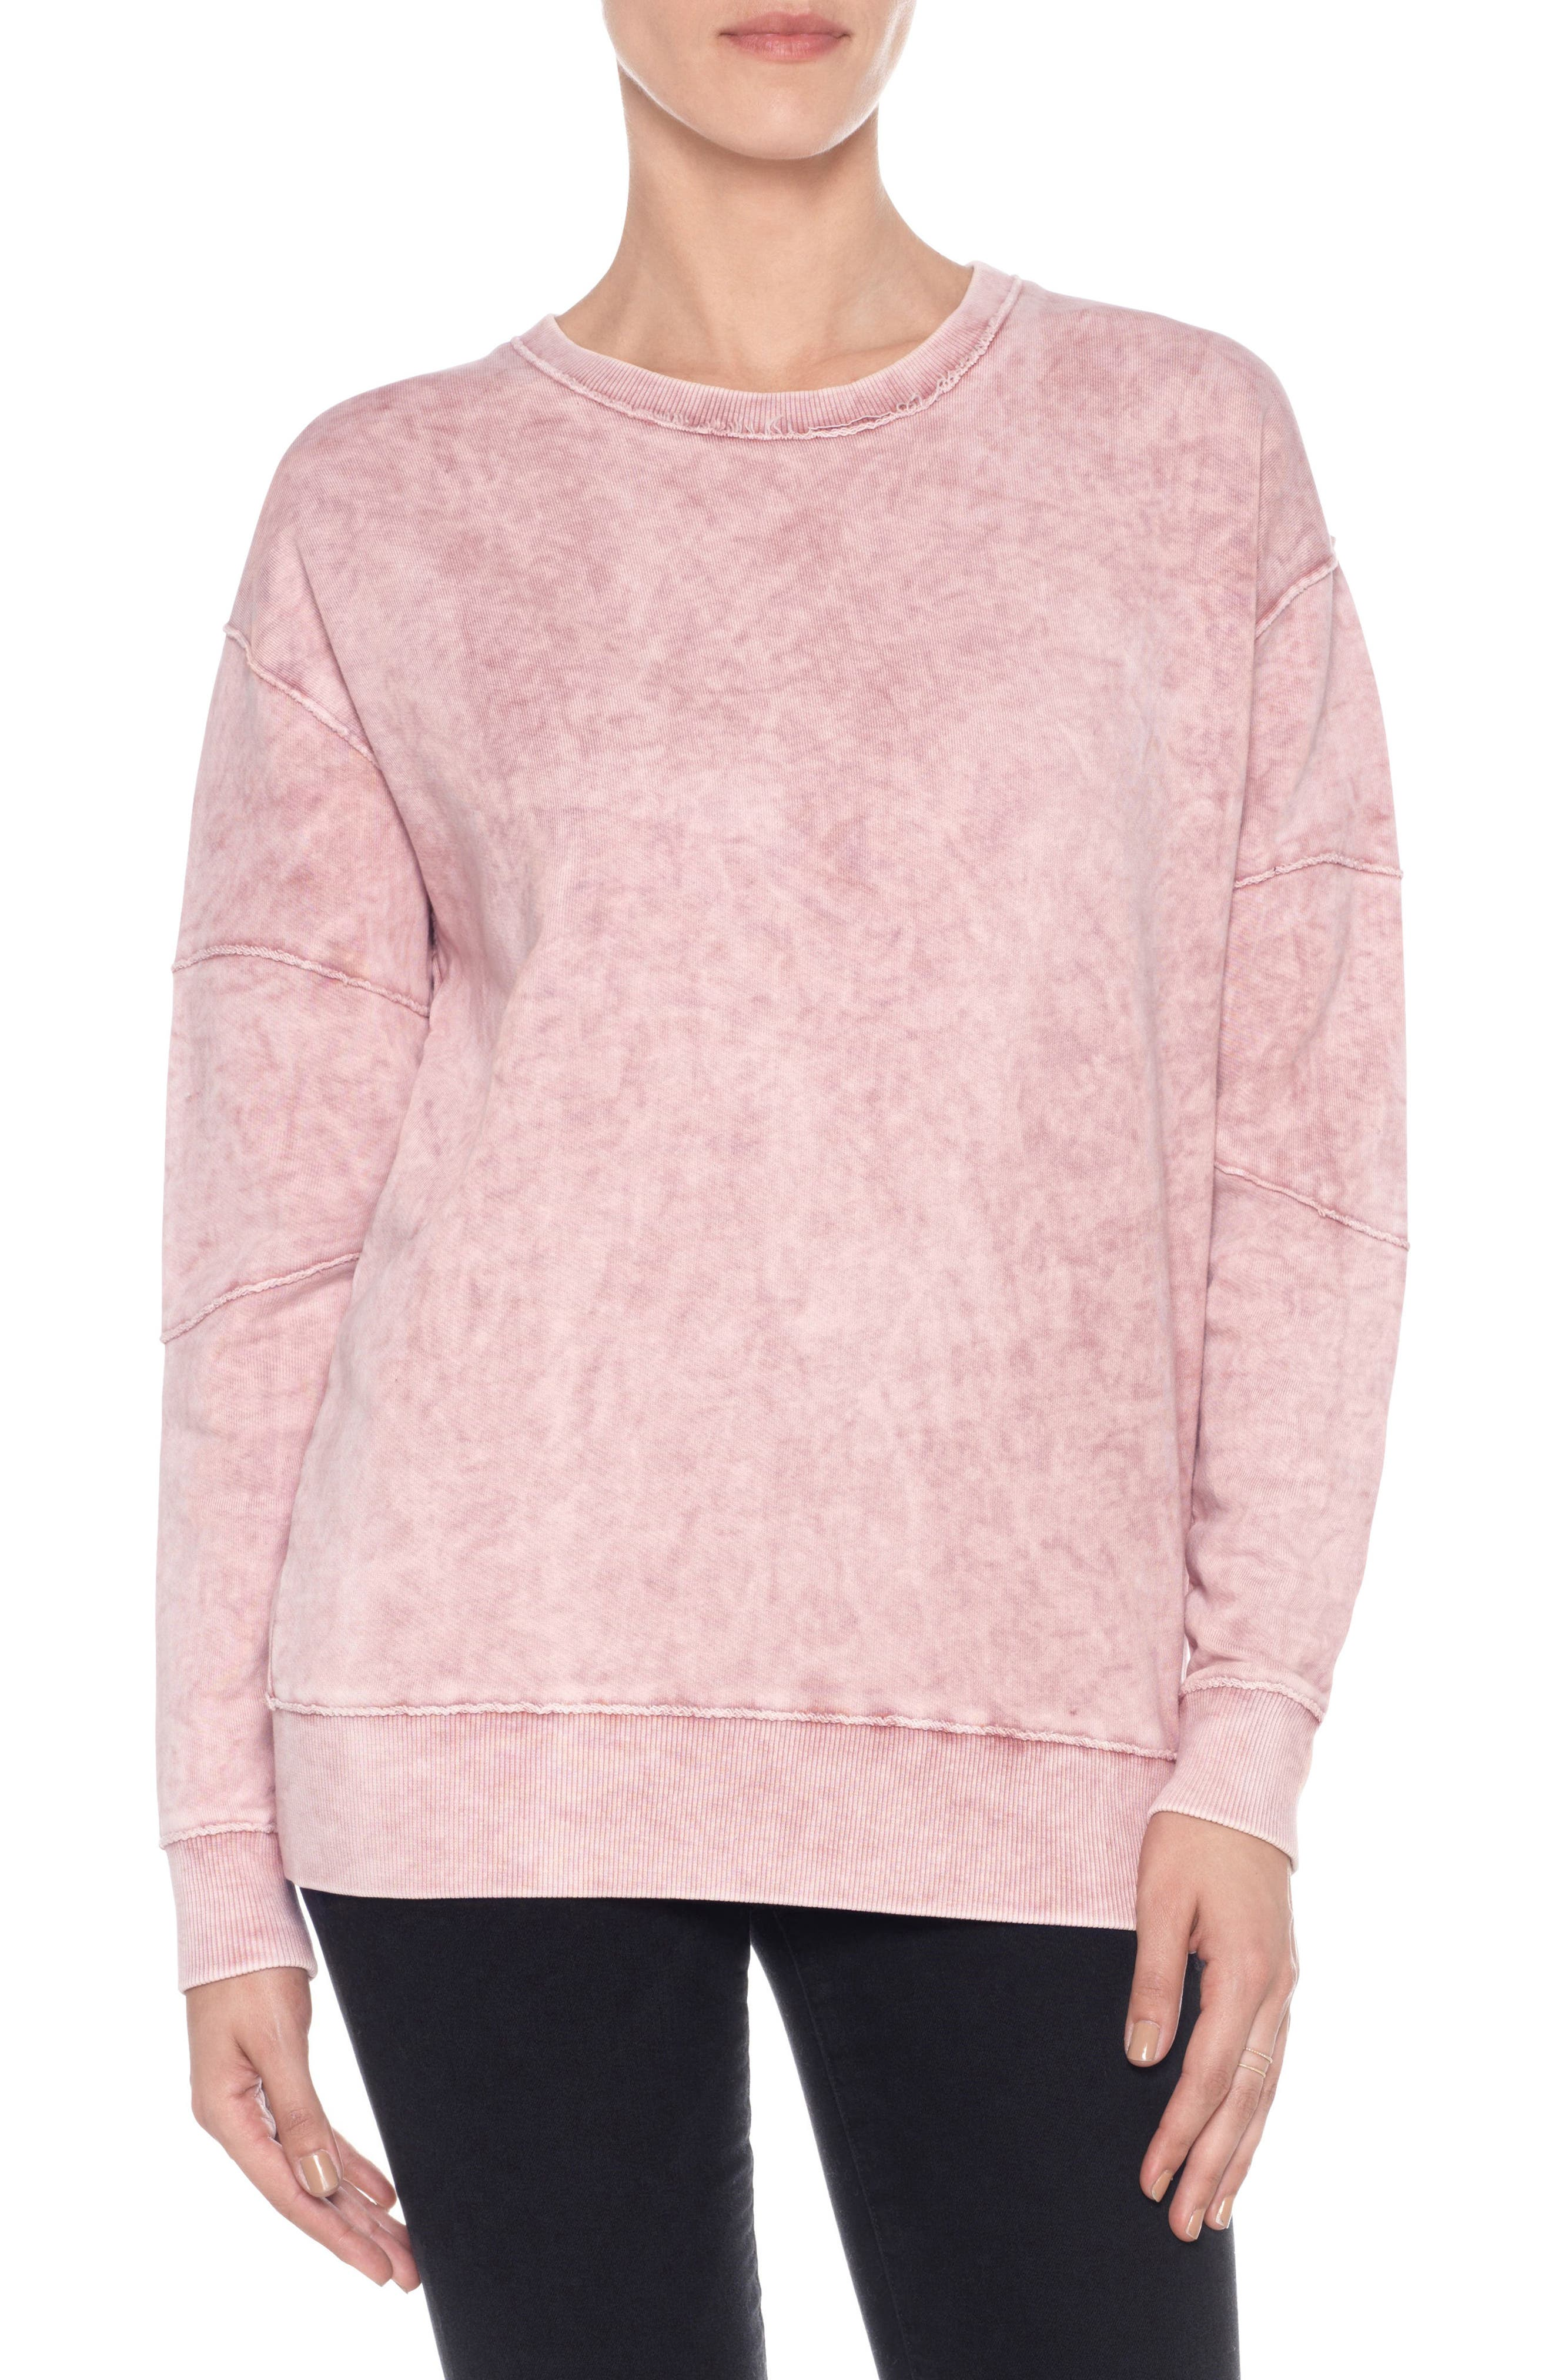 Kendall Sweatshirt,                             Main thumbnail 1, color,                             065